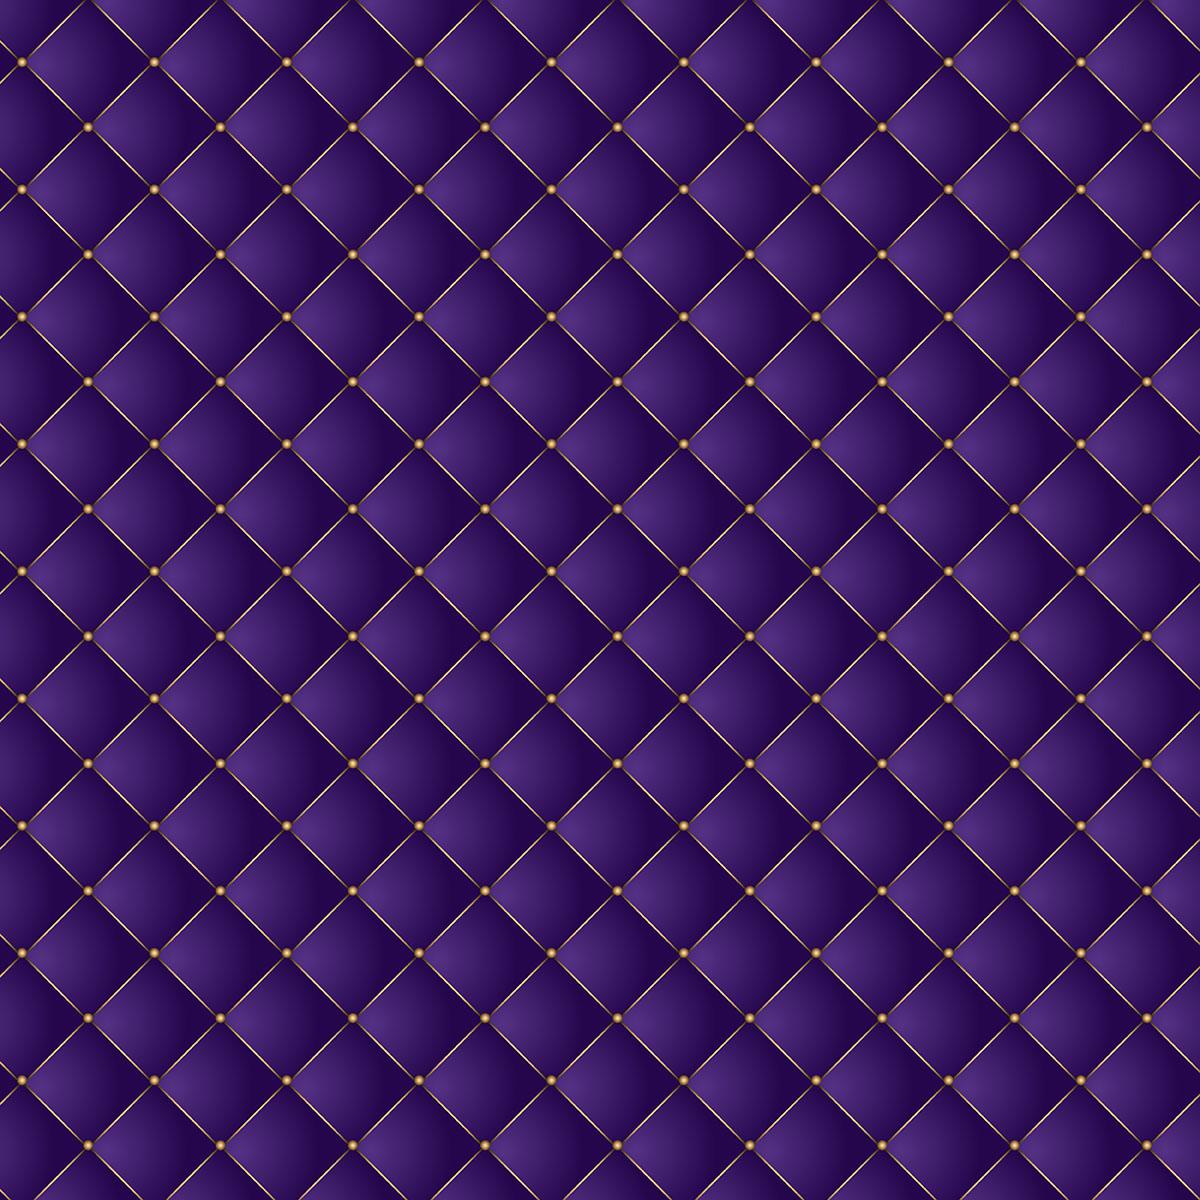 purple and gold background 55573 free downloads. Black Bedroom Furniture Sets. Home Design Ideas